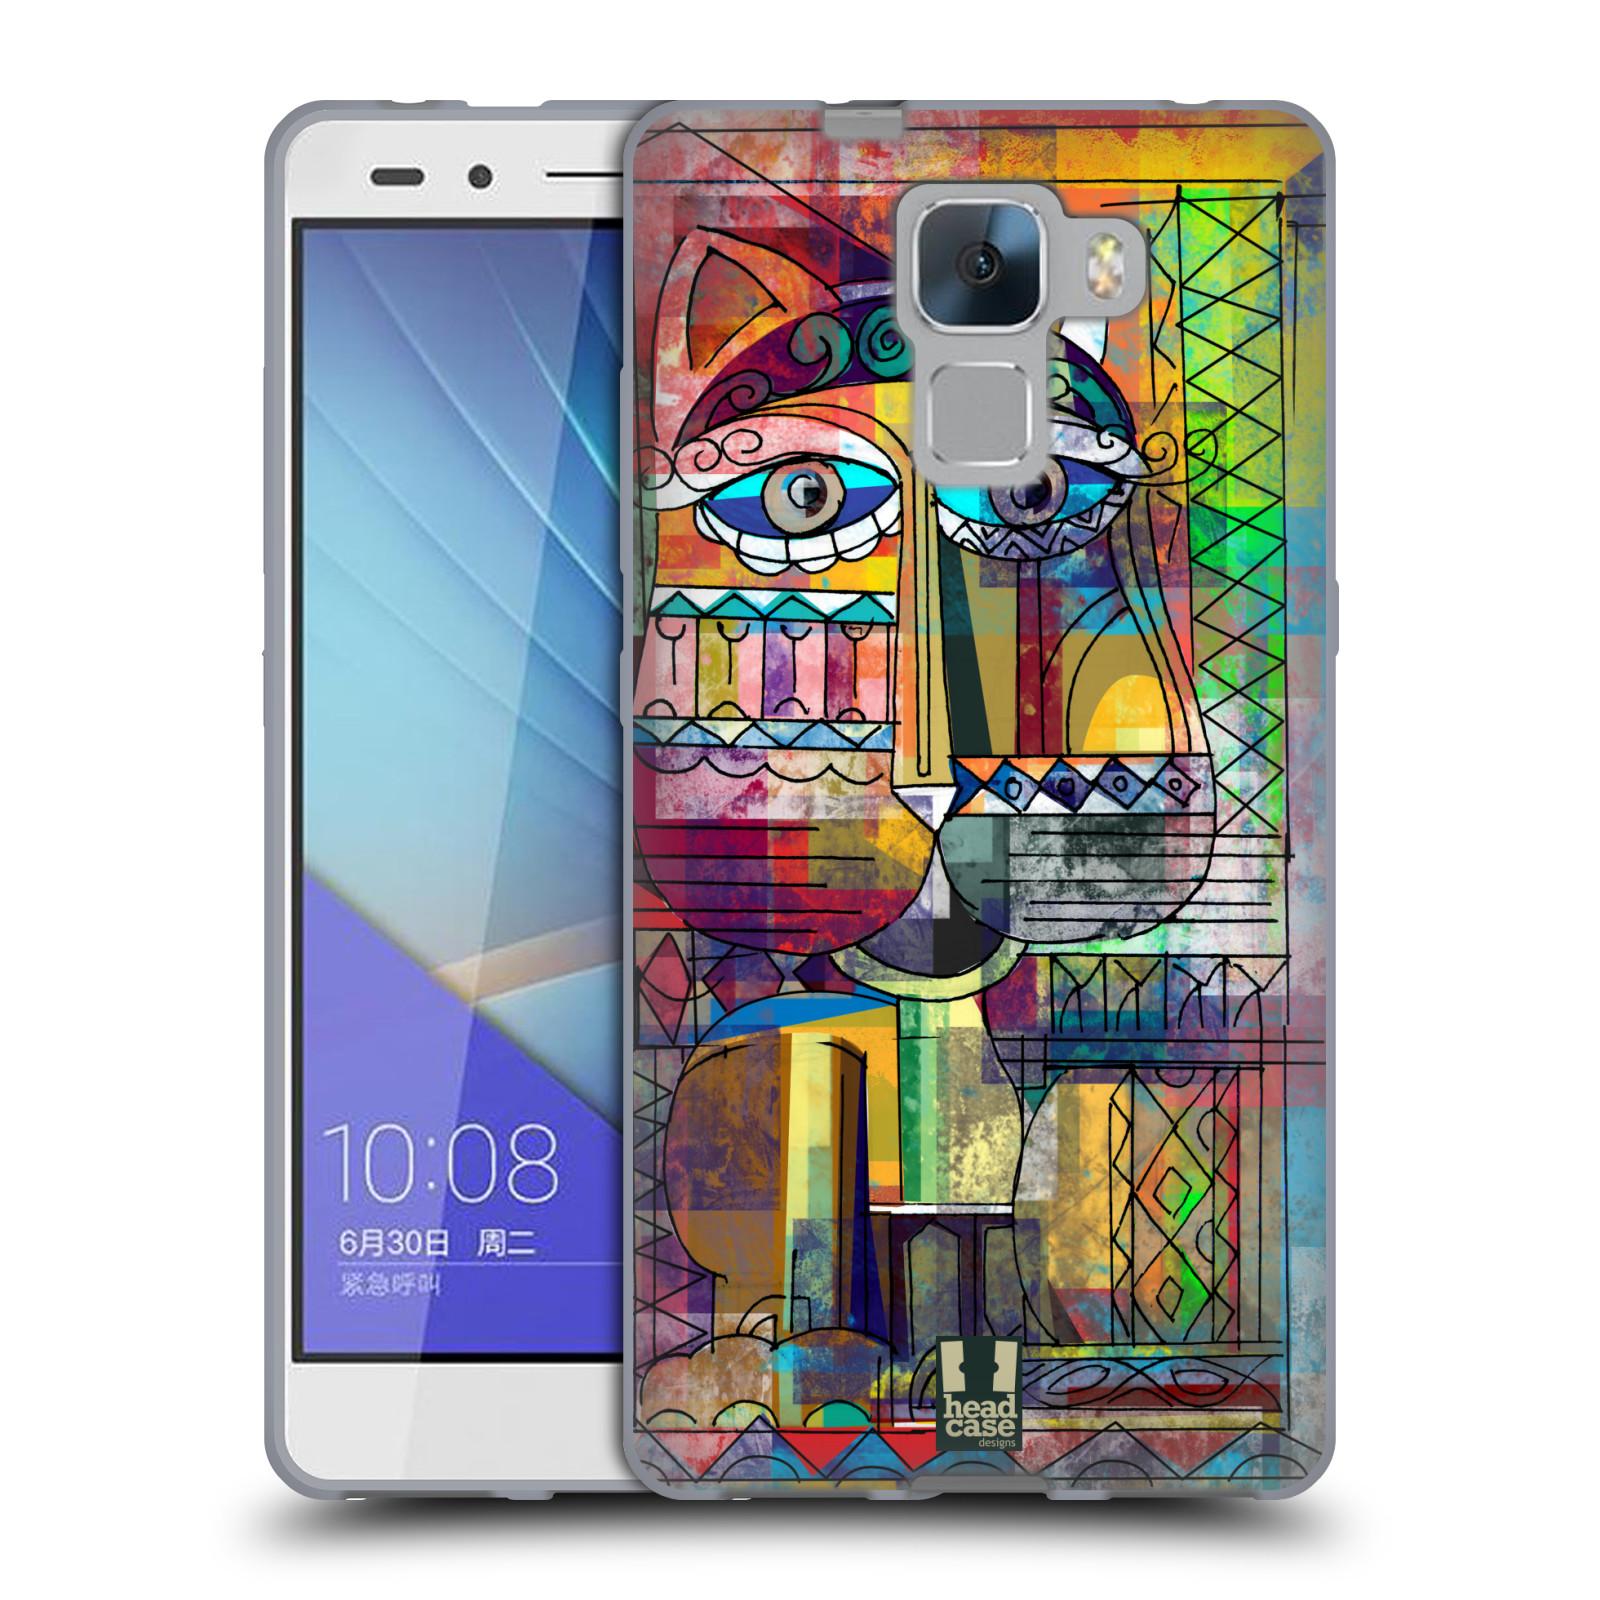 Silikonové pouzdro na mobil Honor 7 HEAD CASE AZTEC KORAT